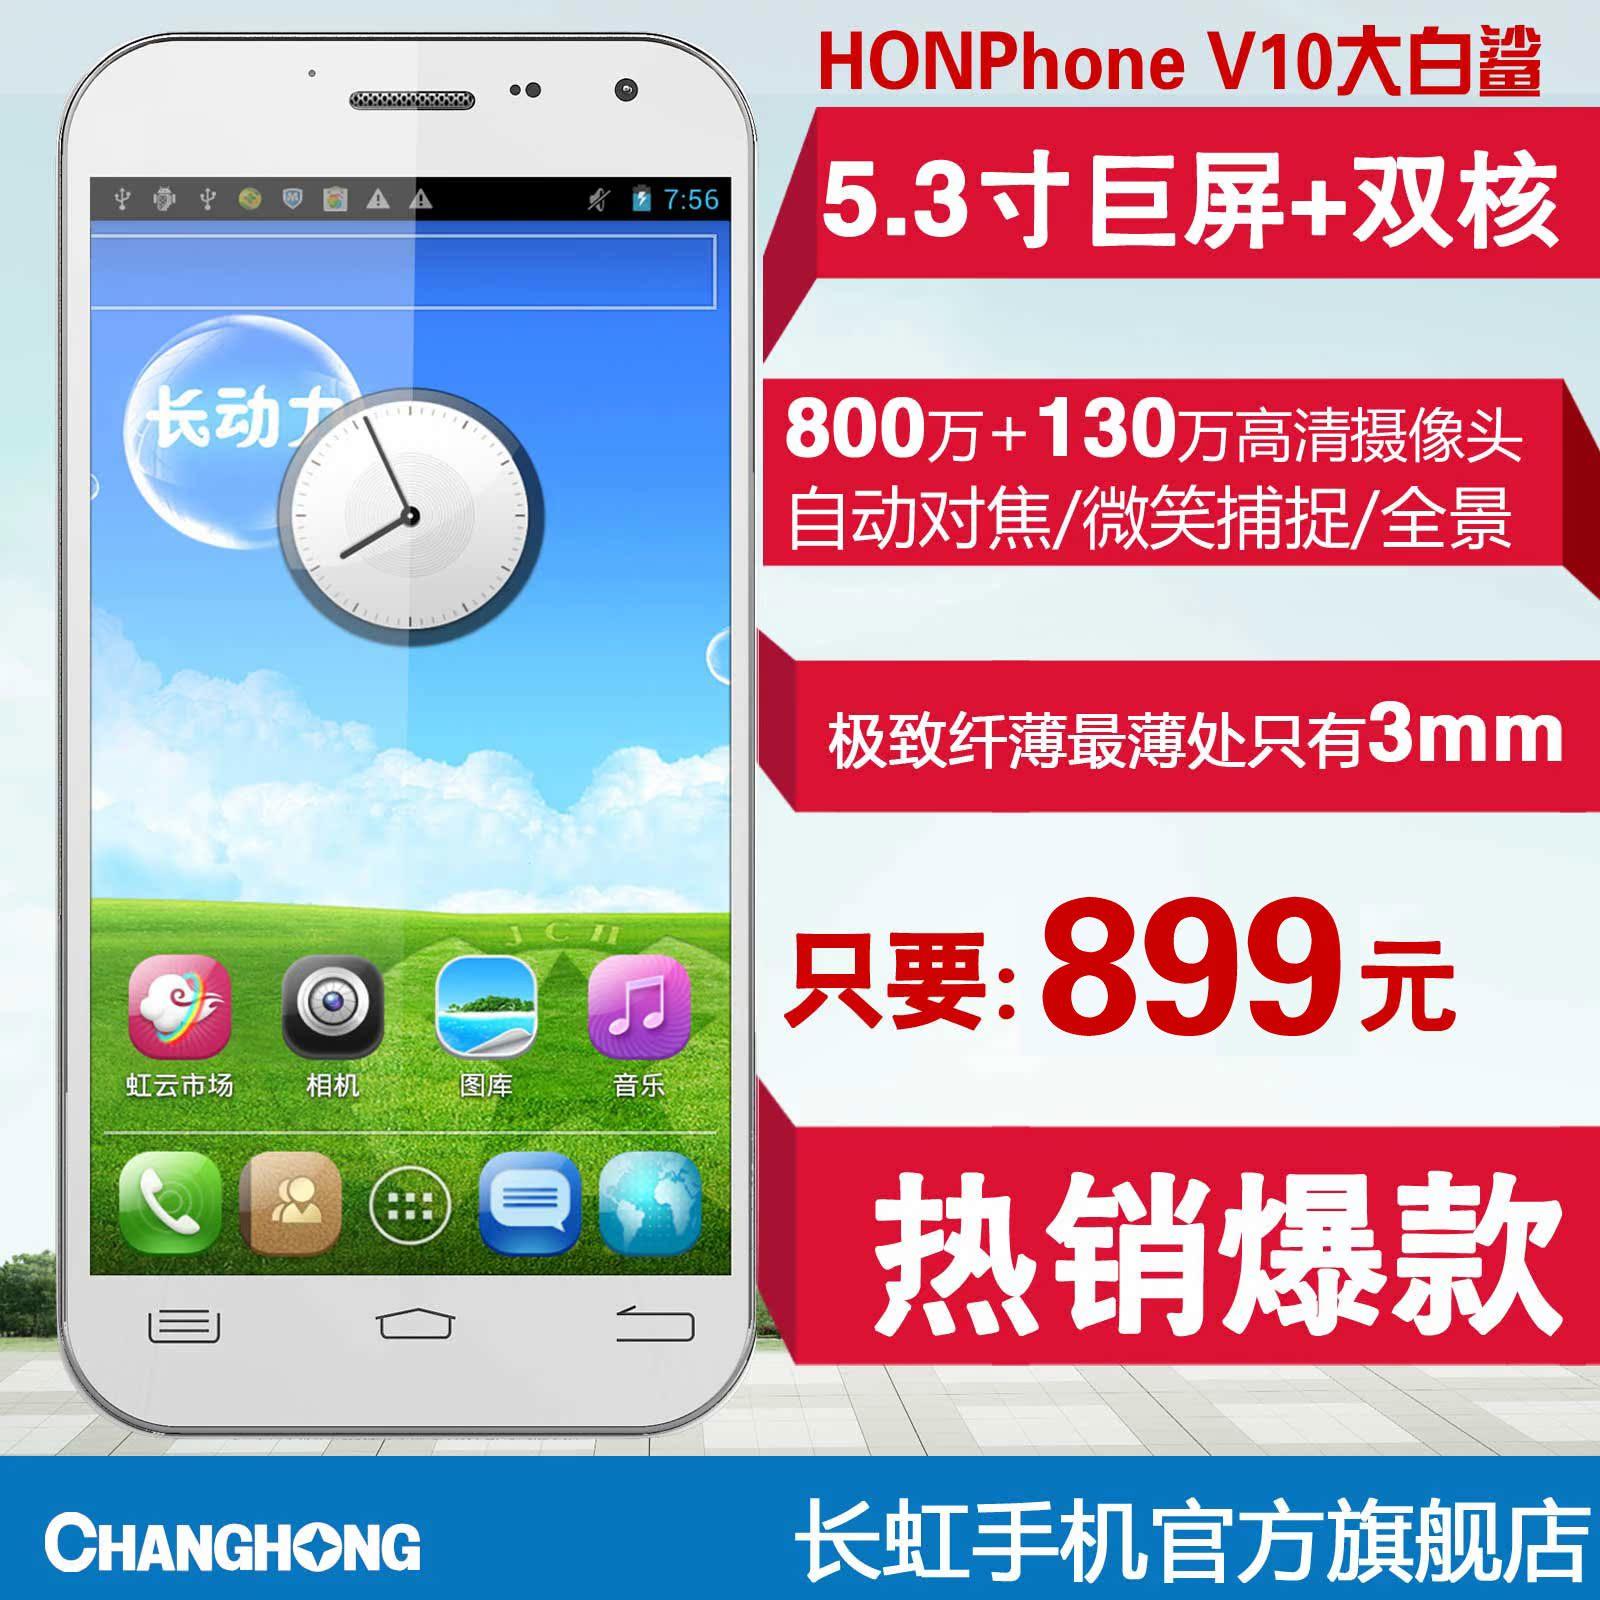 Changhong/长虹 V10 大白鲨 双核 四核 800W 5.3寸安卓智能手机 价格:899.00